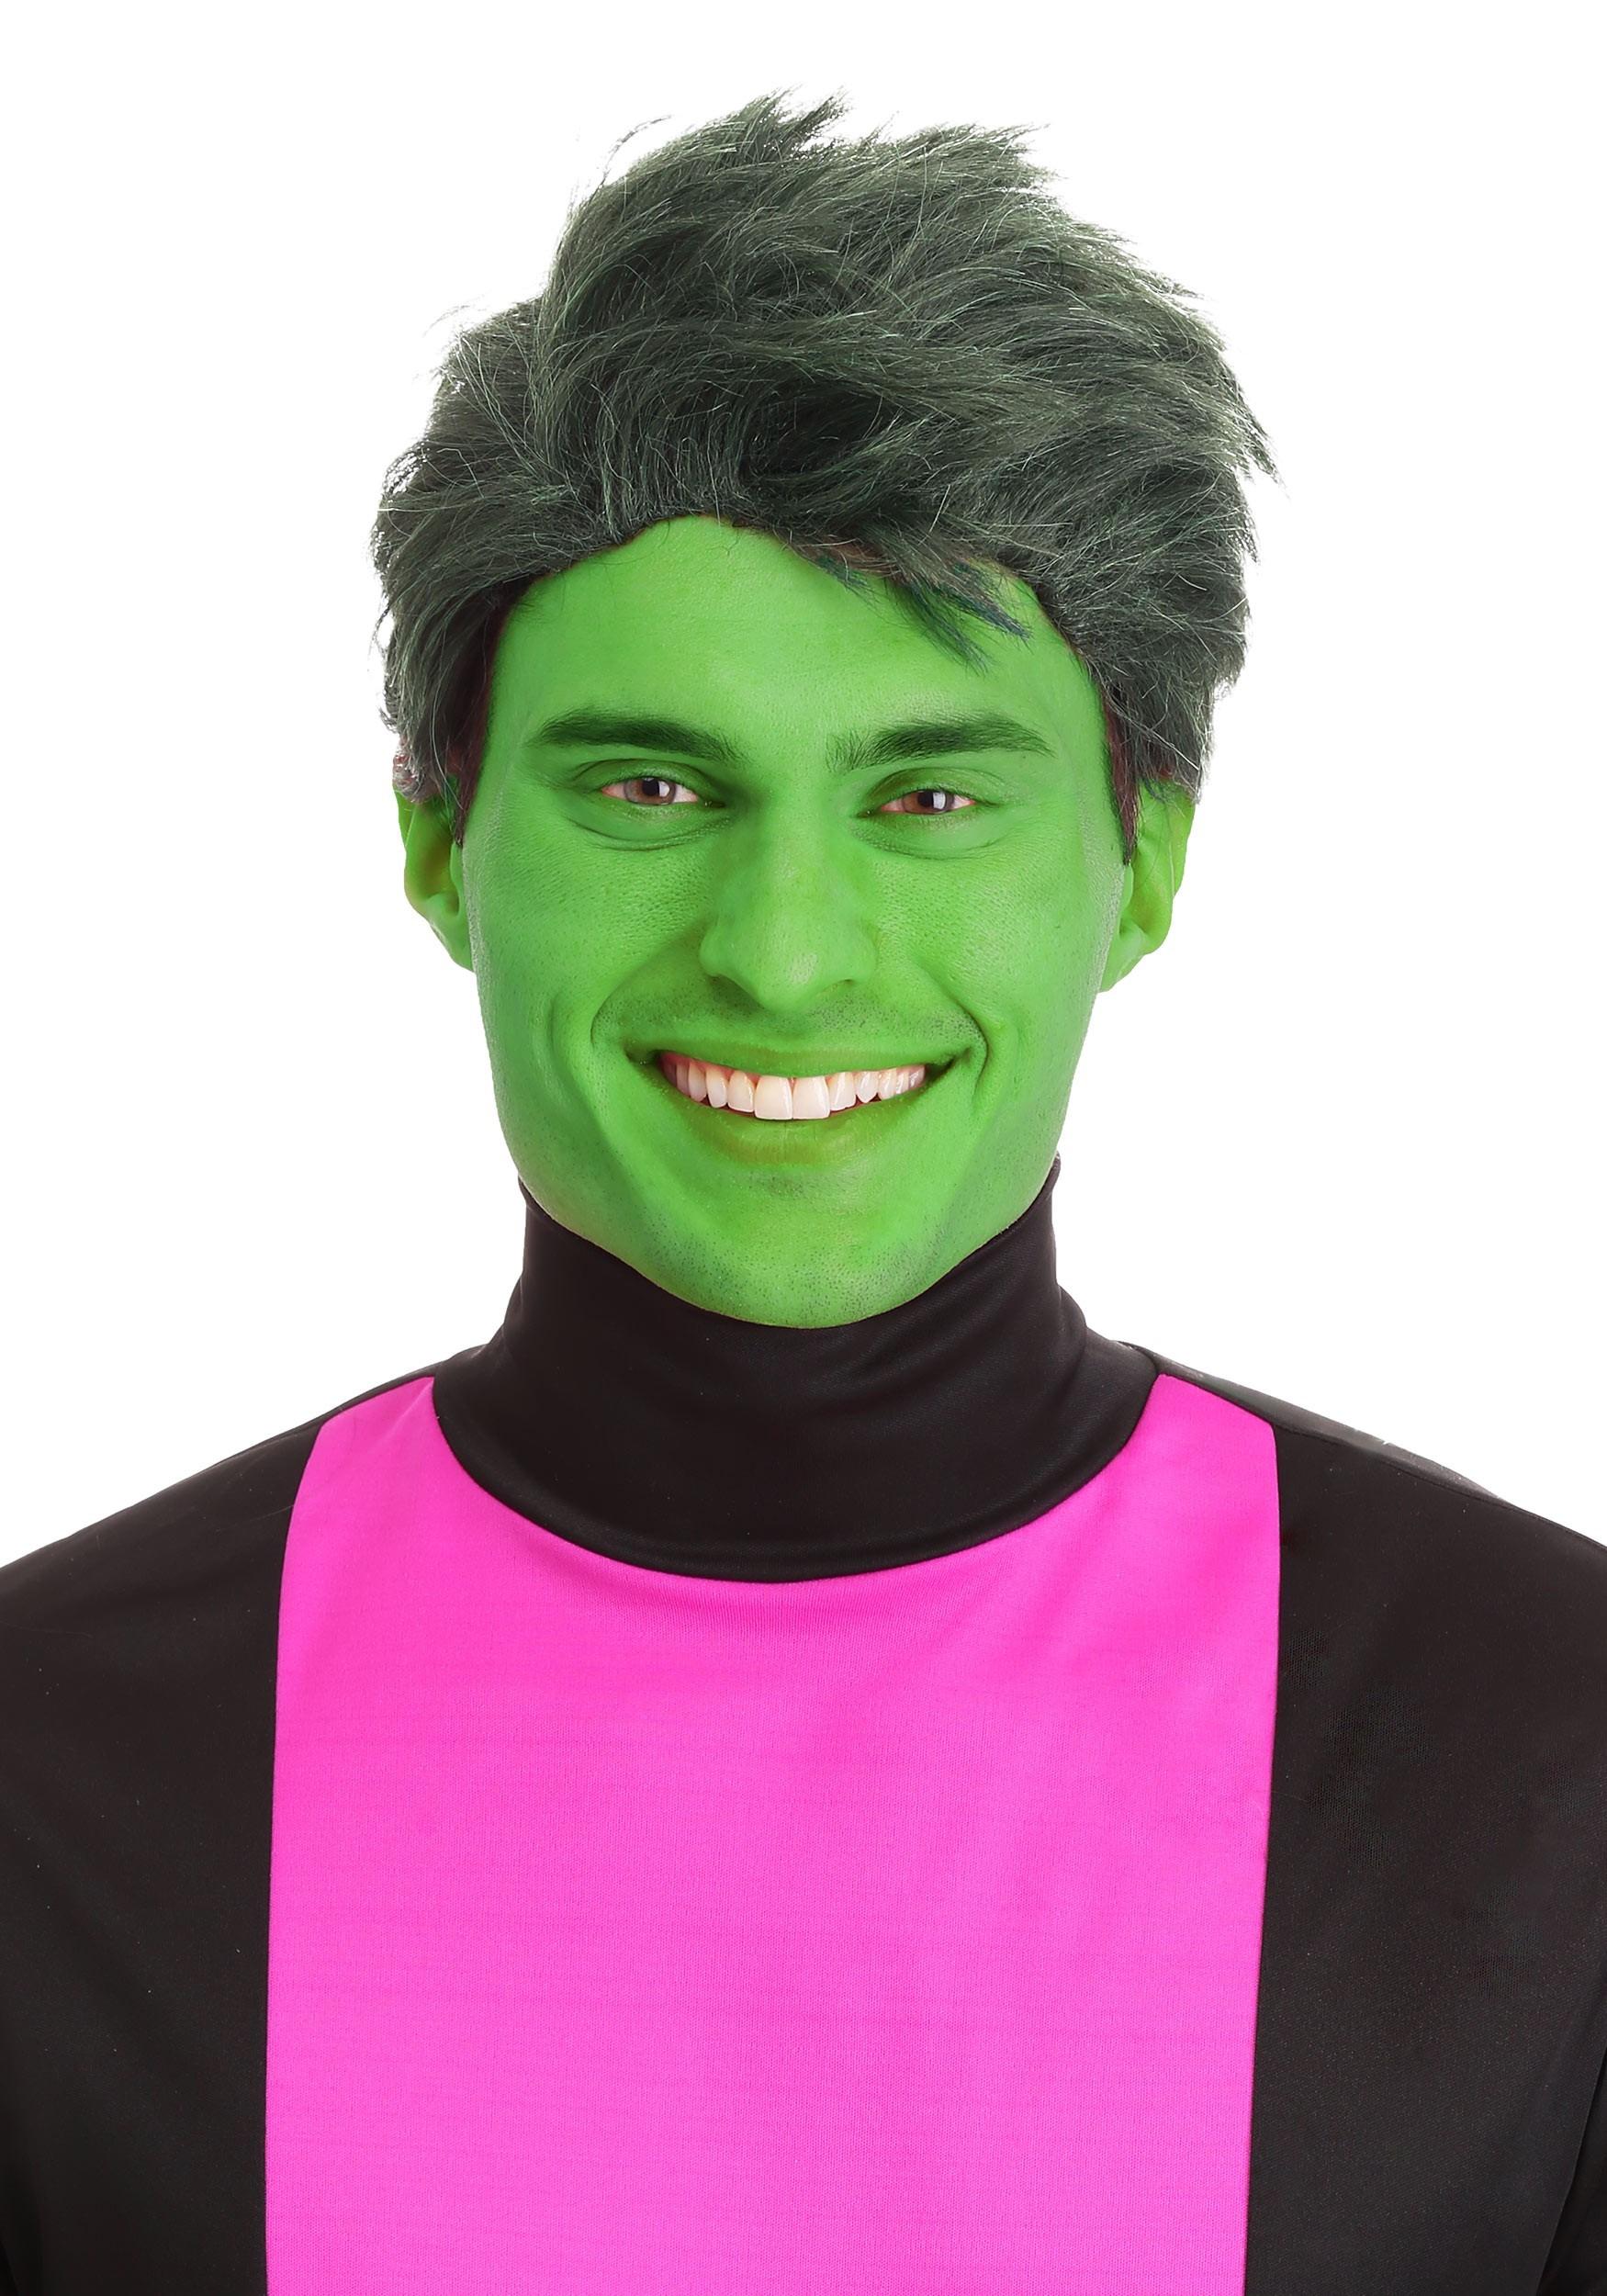 Green Shapeshifting Superhero Wig for Men